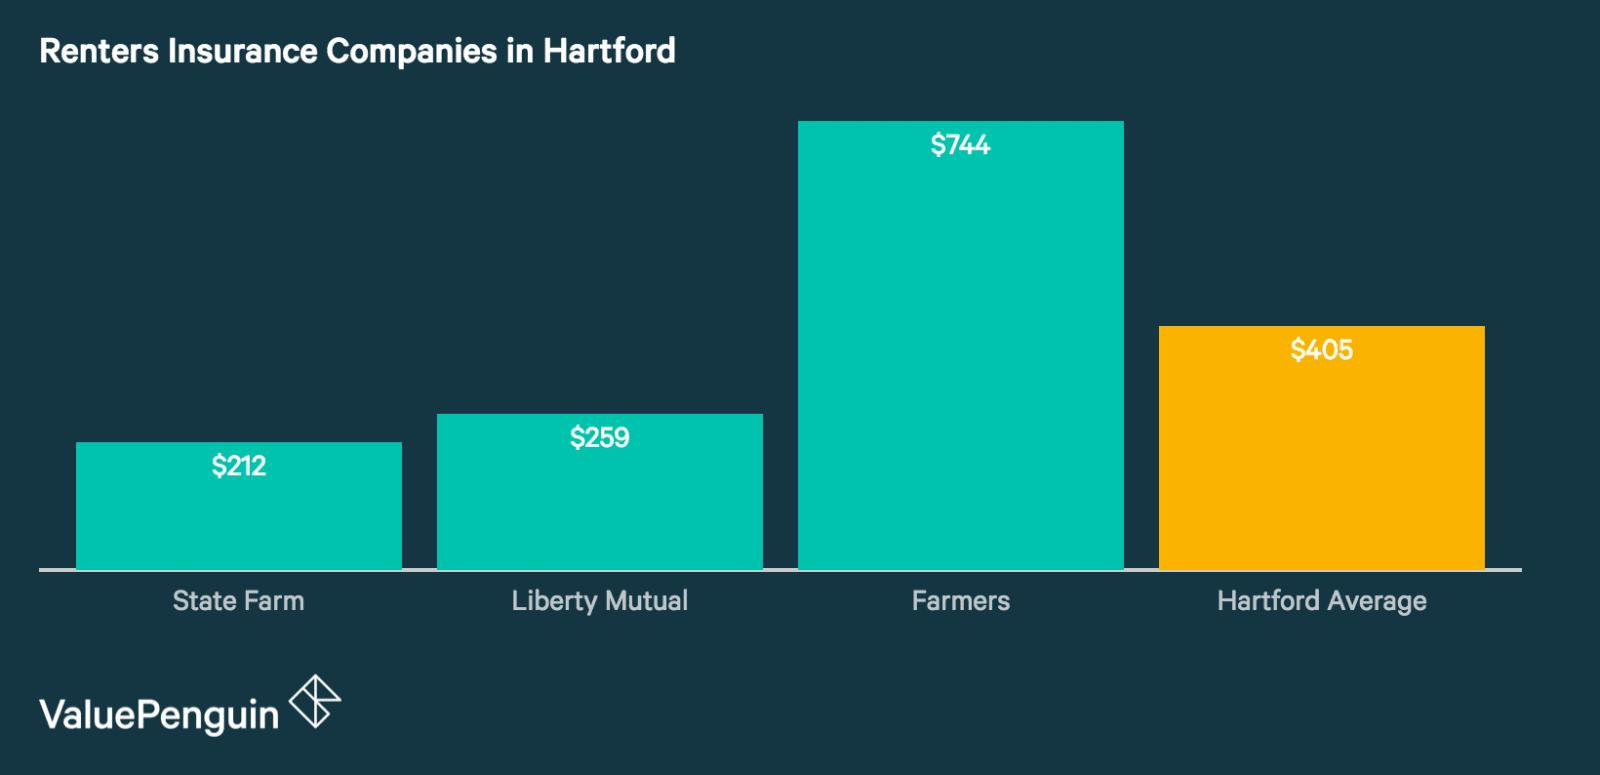 Best Renters Insurance Companies in Hartford